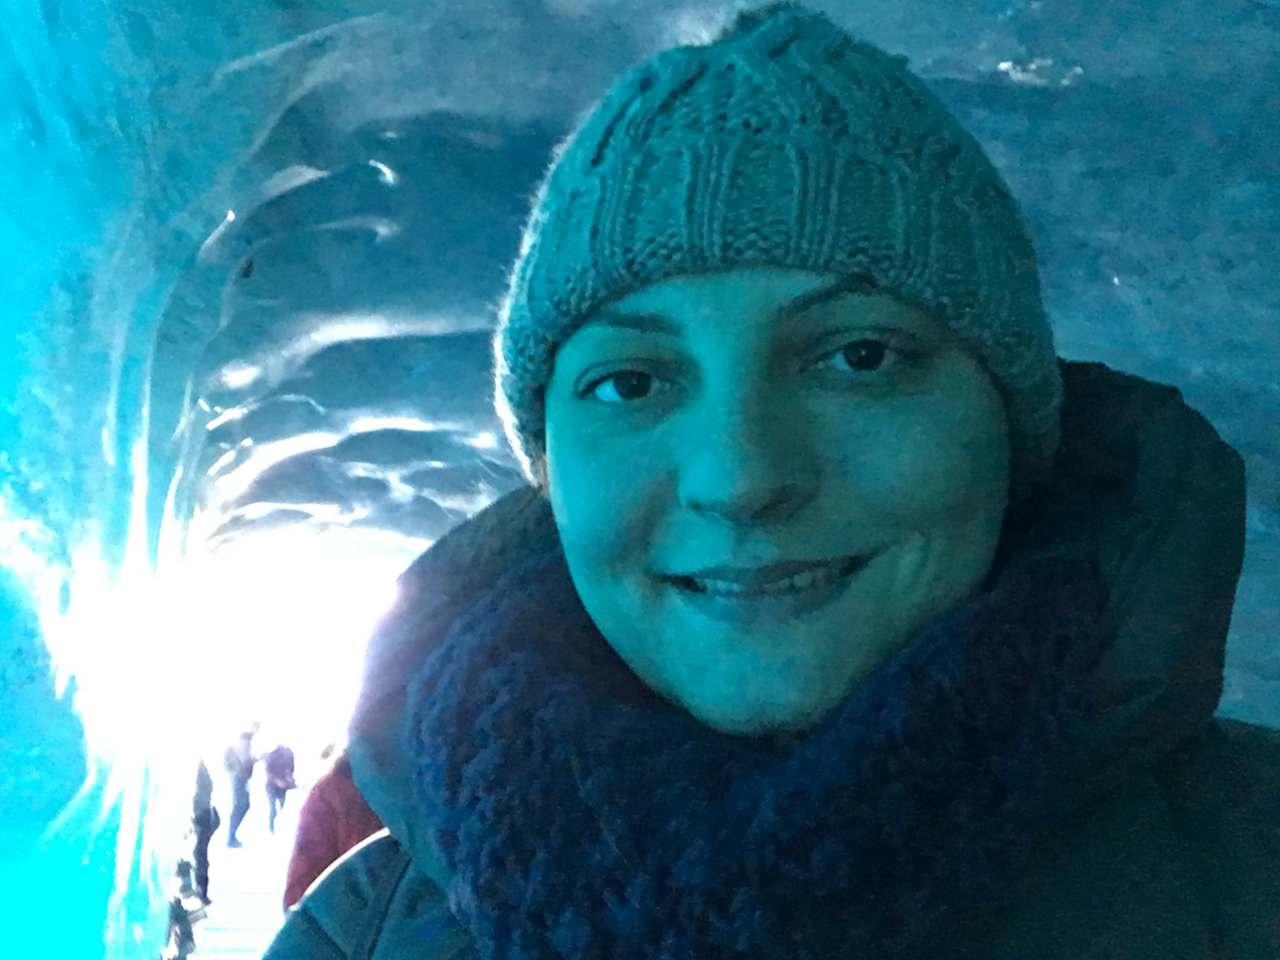 Turista na caverna de gelo em Chamonix